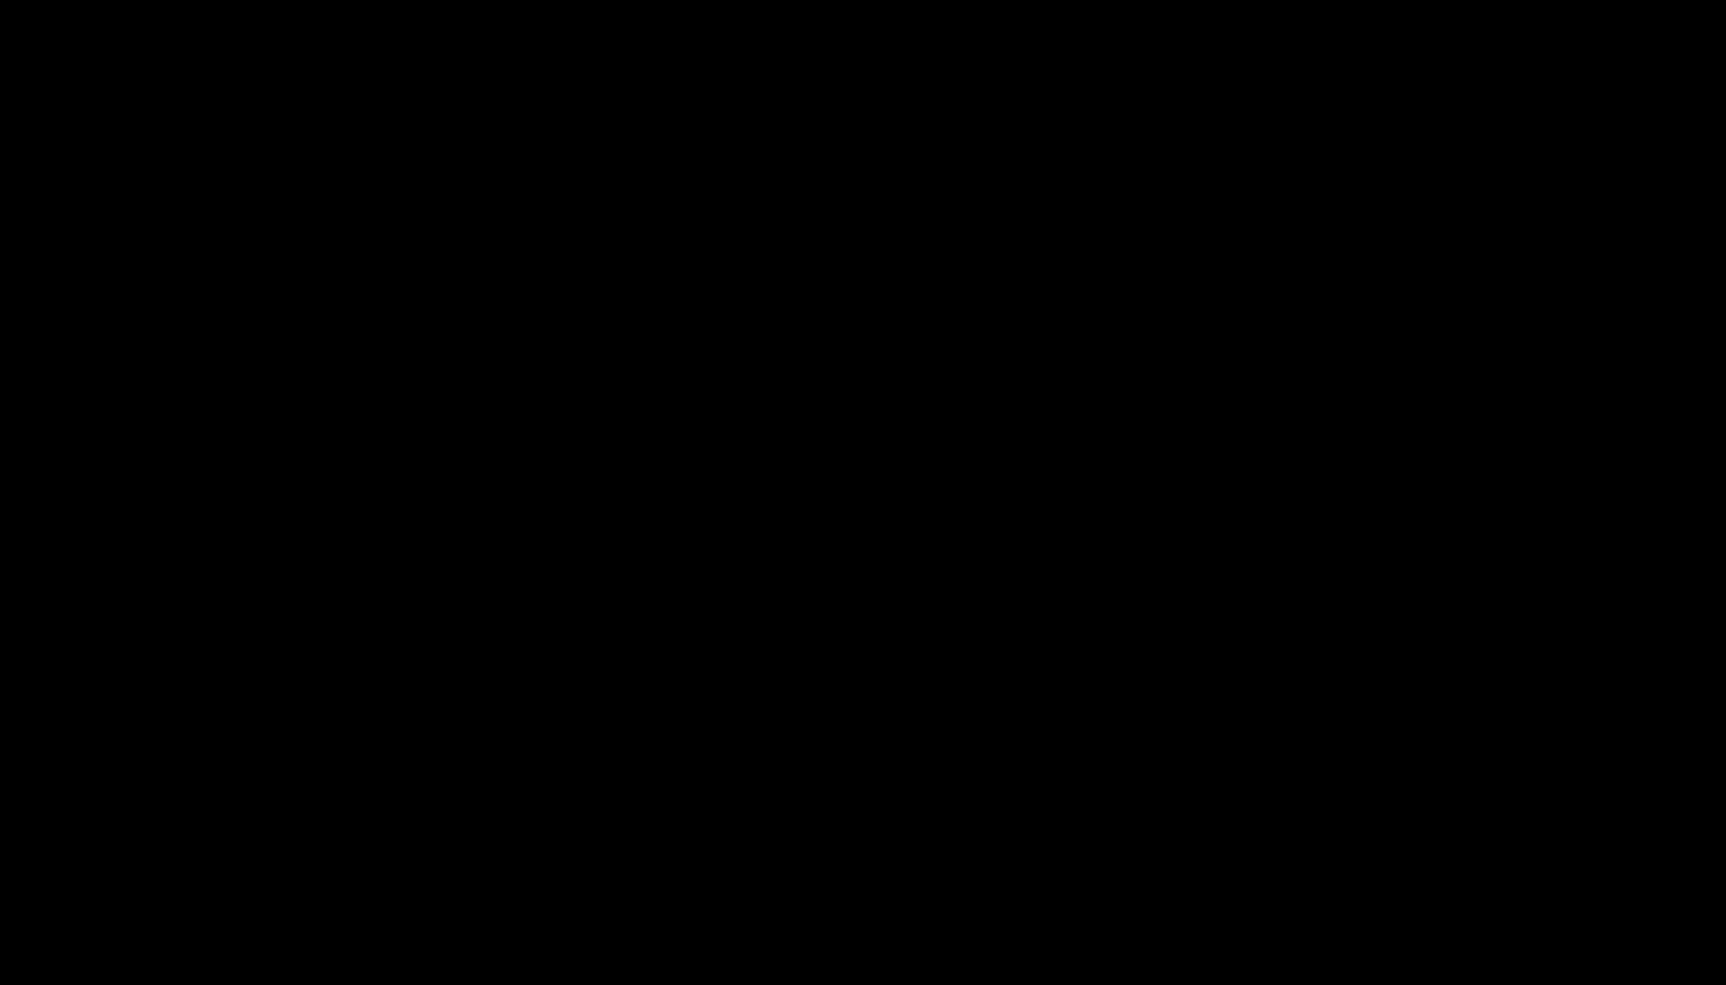 Biotin-dPEG®₃-Lipoamide